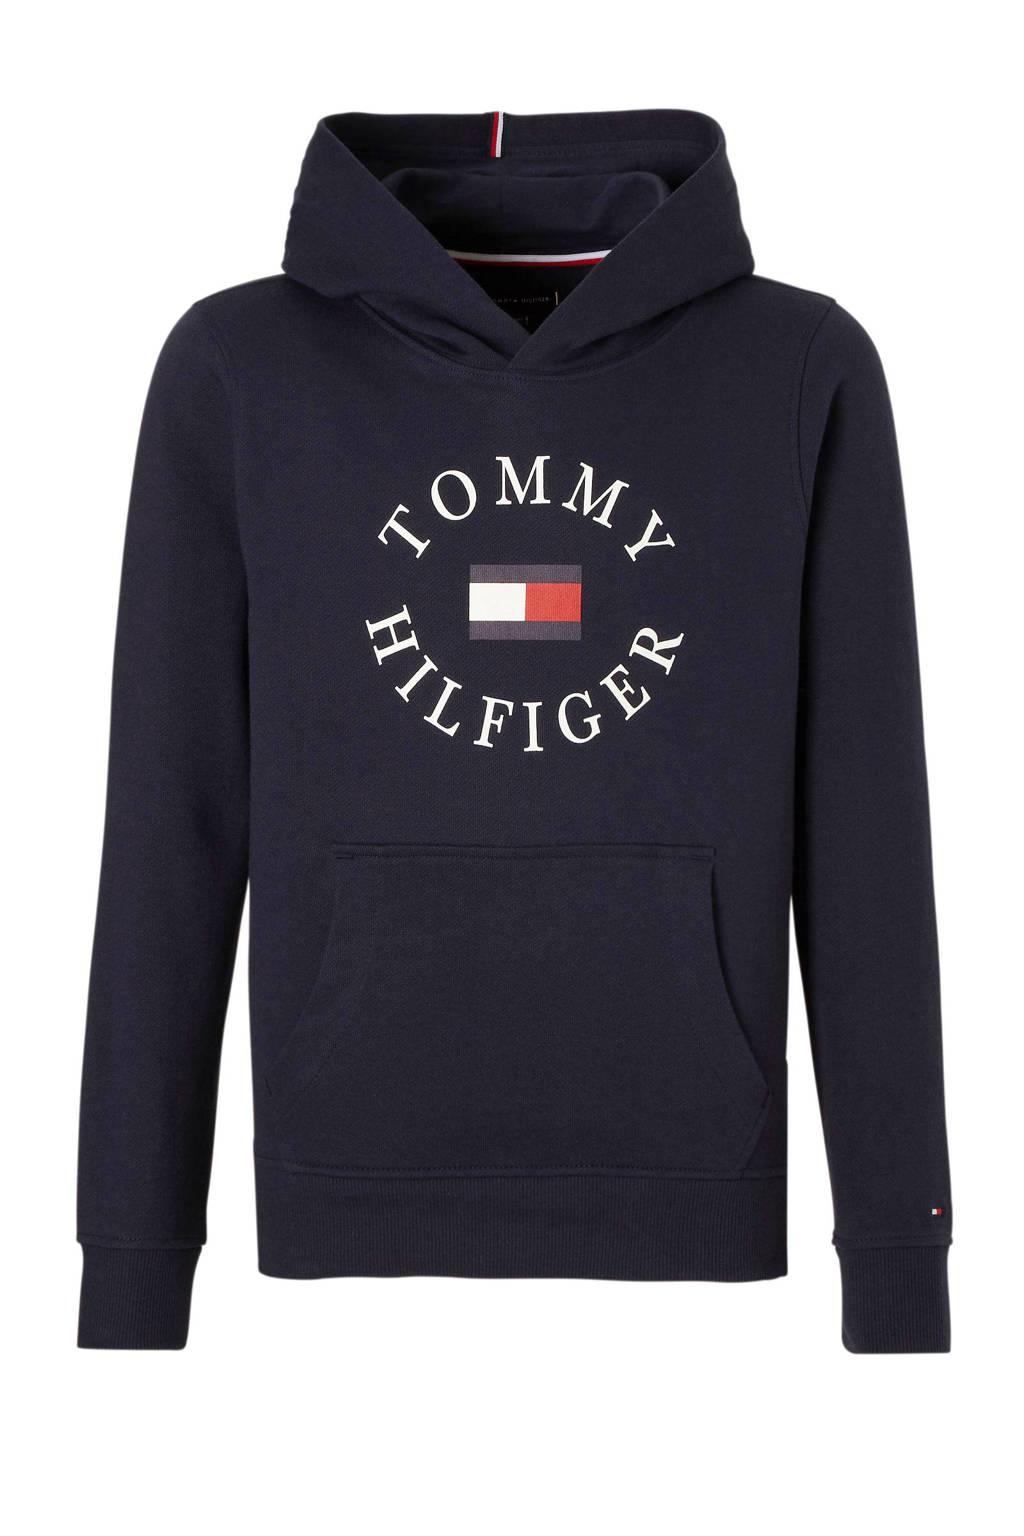 Tommy Hilfiger hoodie met logo donkerblauw, Donkerblauw